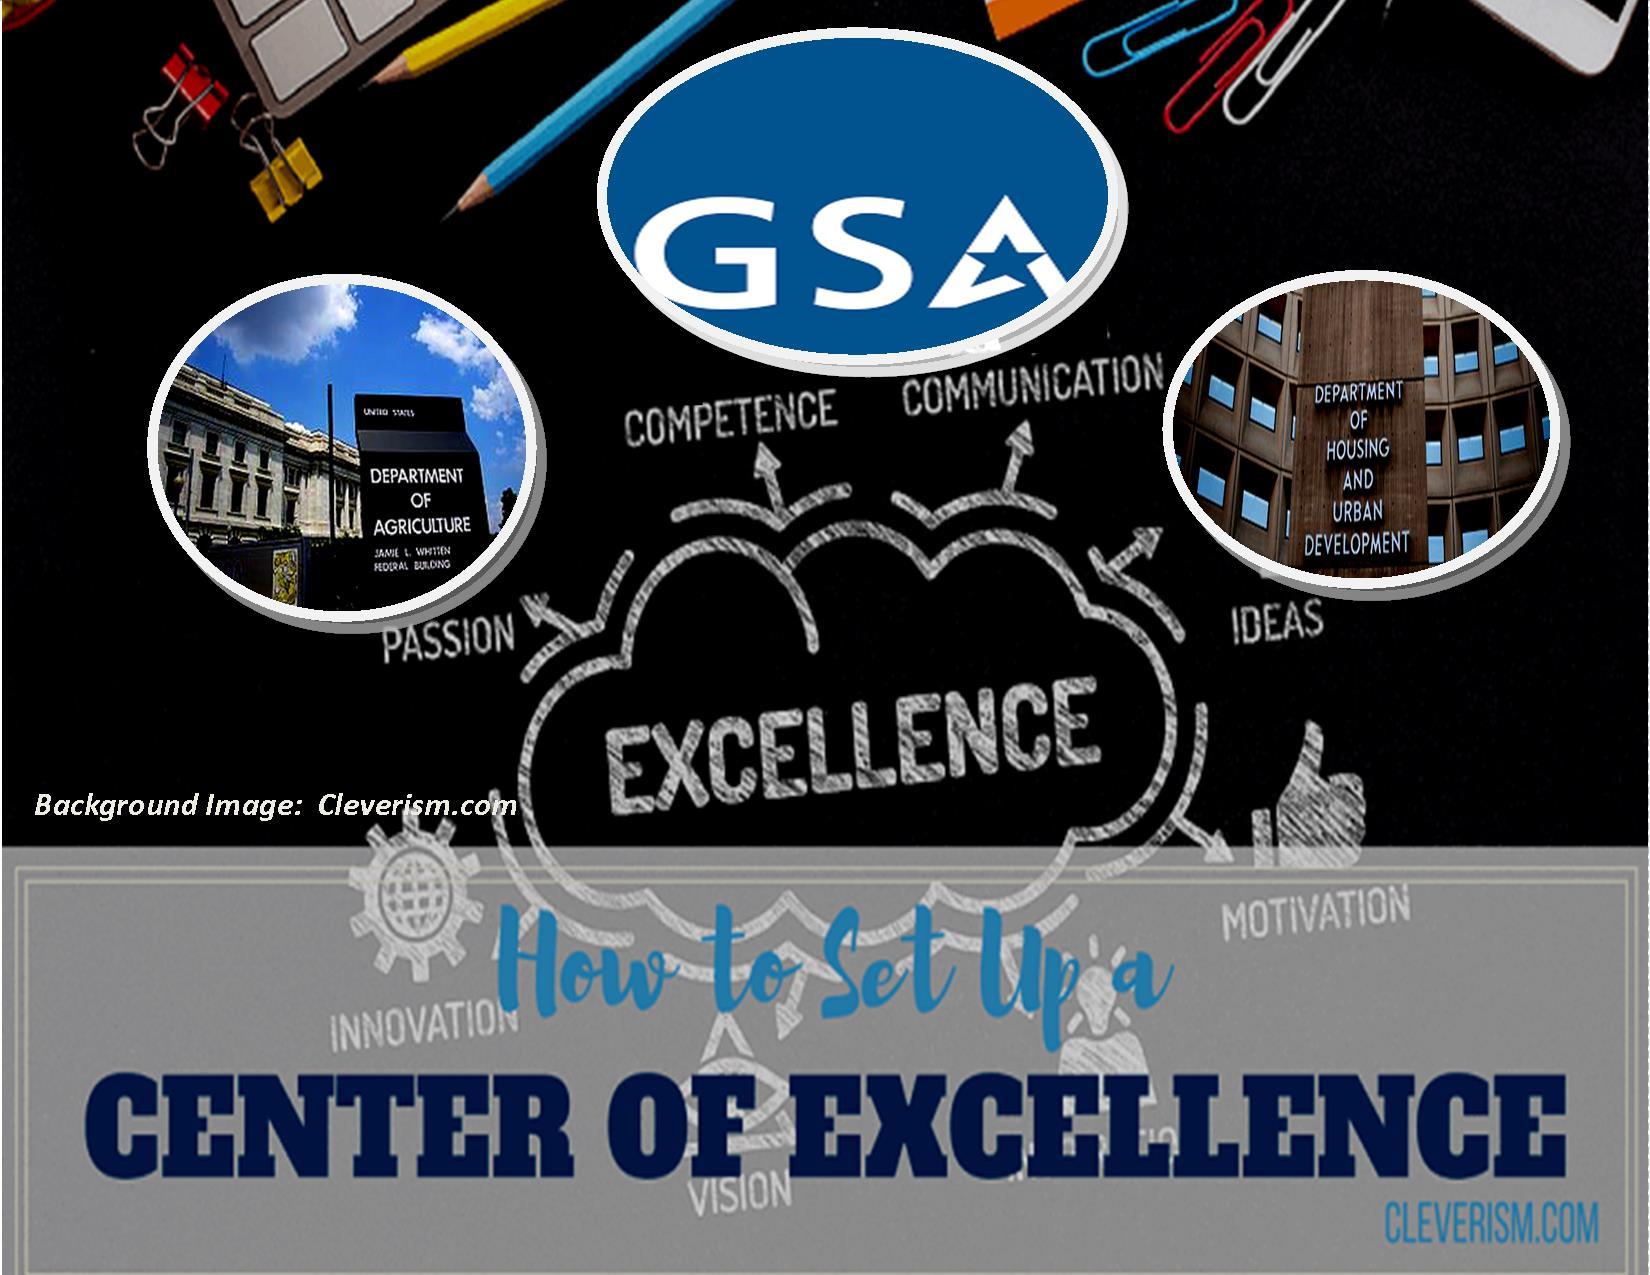 GSA 2nd Center of Excellence